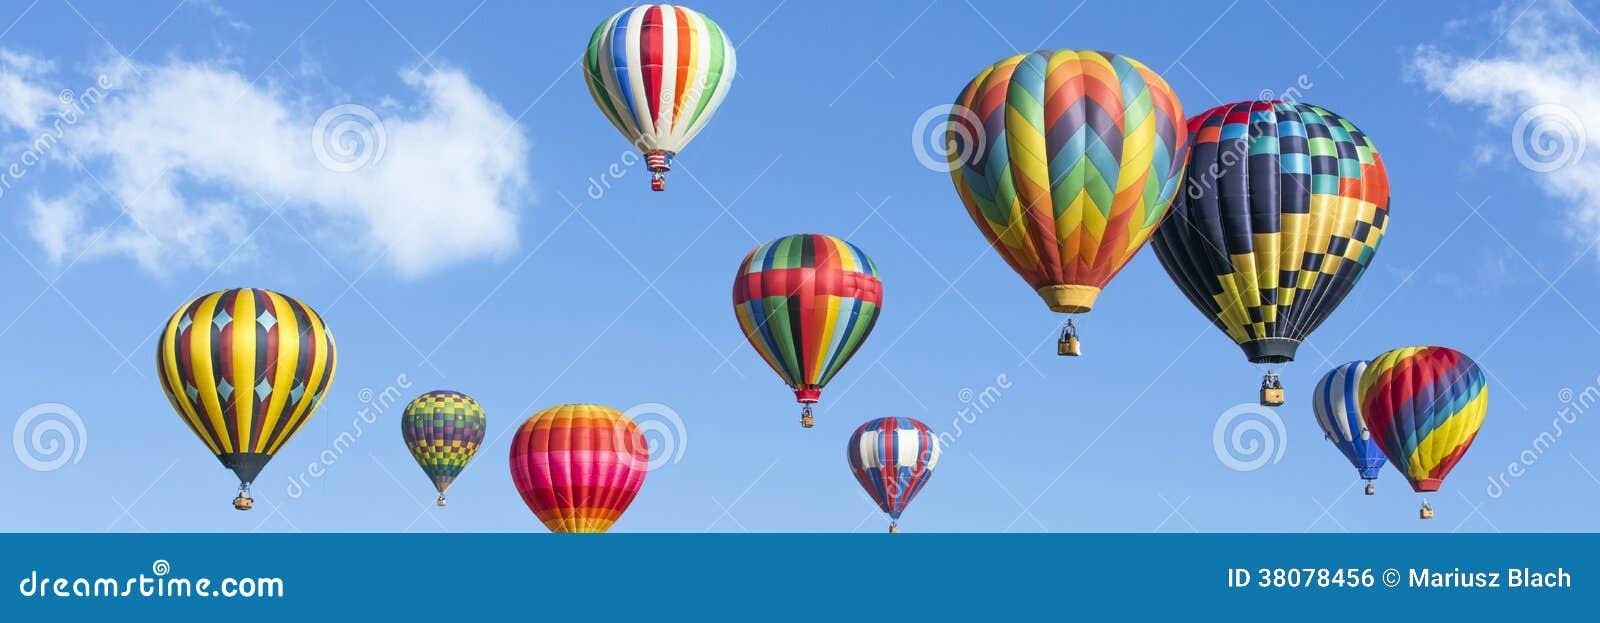 Hot air balloons panorama